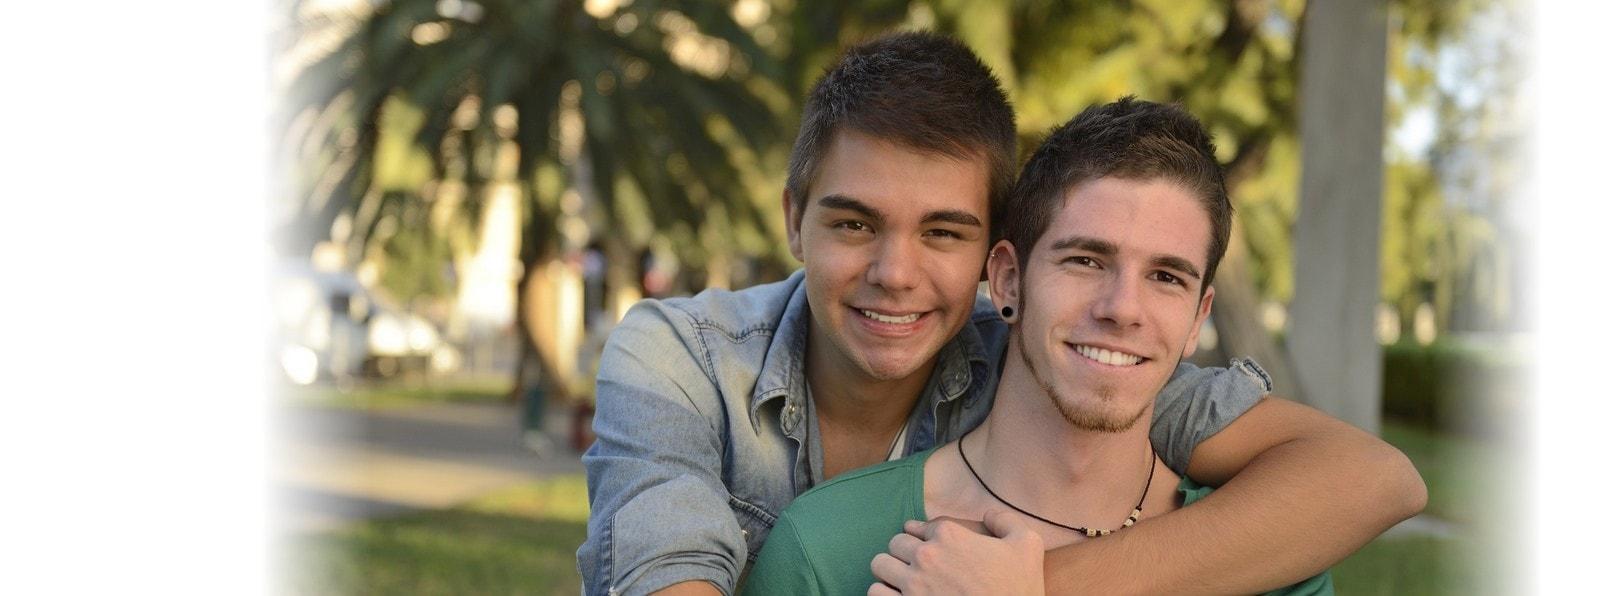 bg gay couple cherche amant